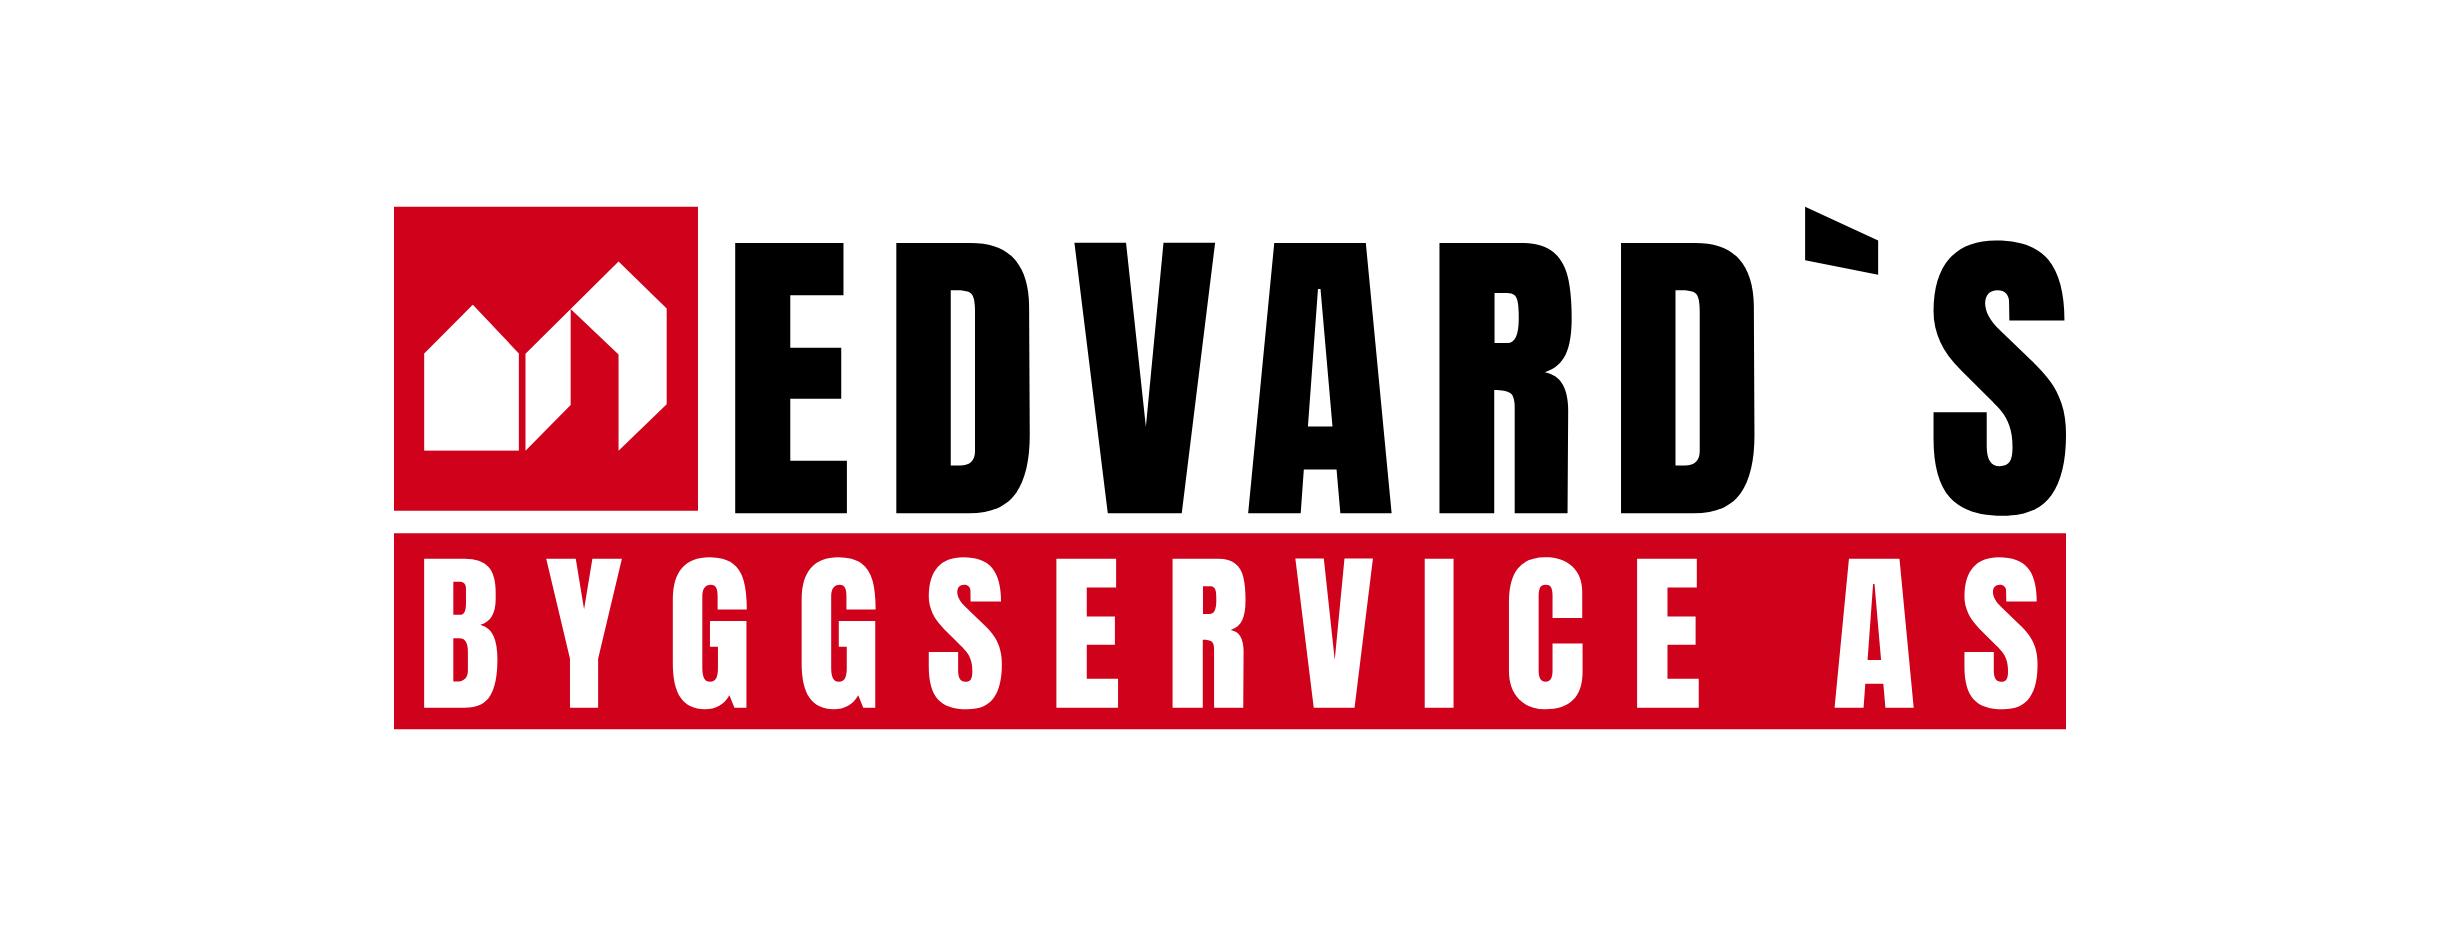 Edvards Byggservice